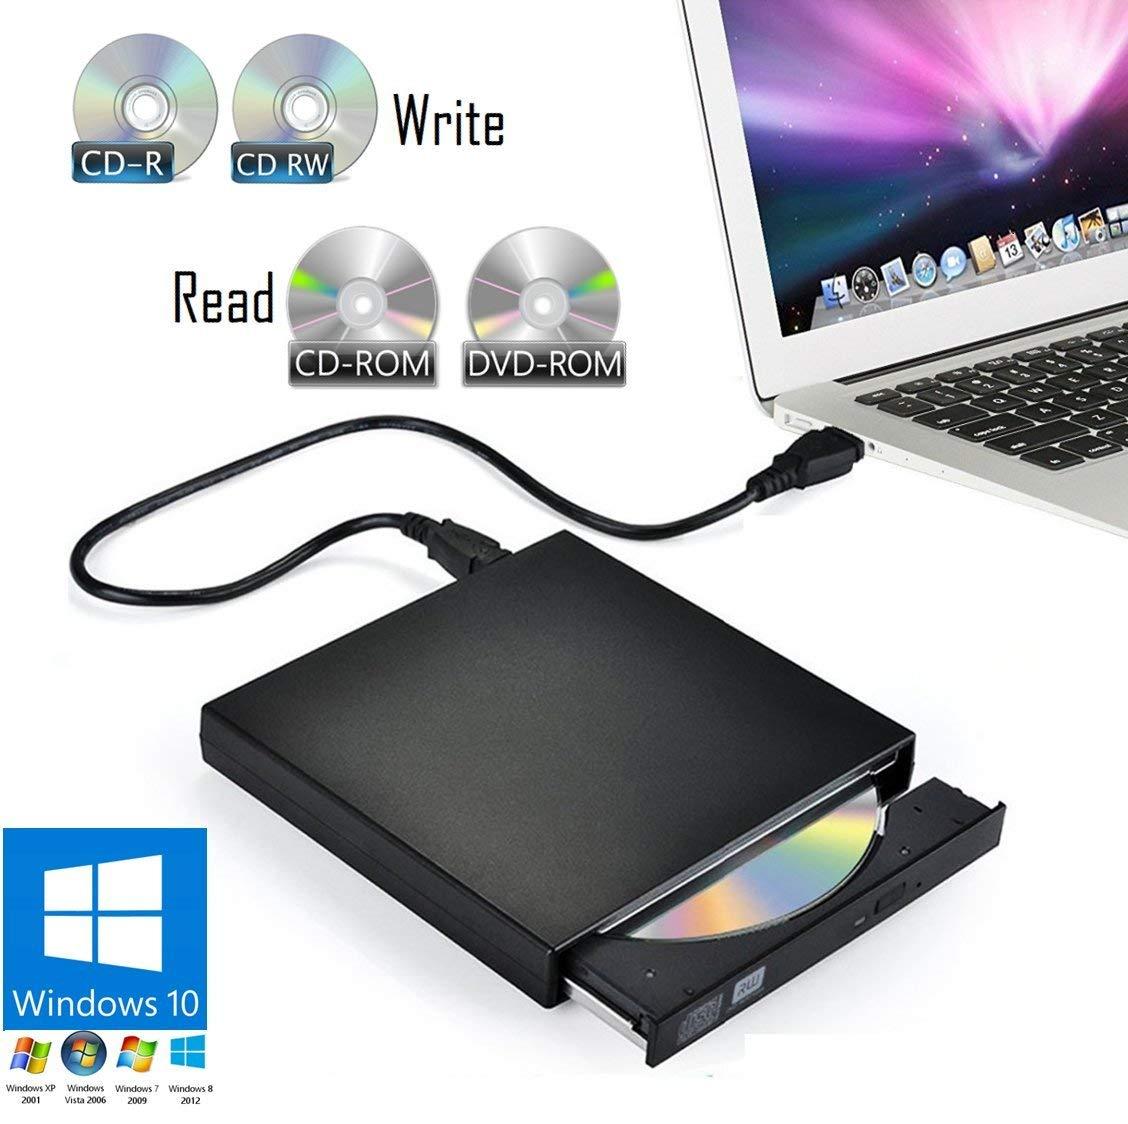 External USB DVD-ROM Drive Player & CD-R/RW Writer Burner fo